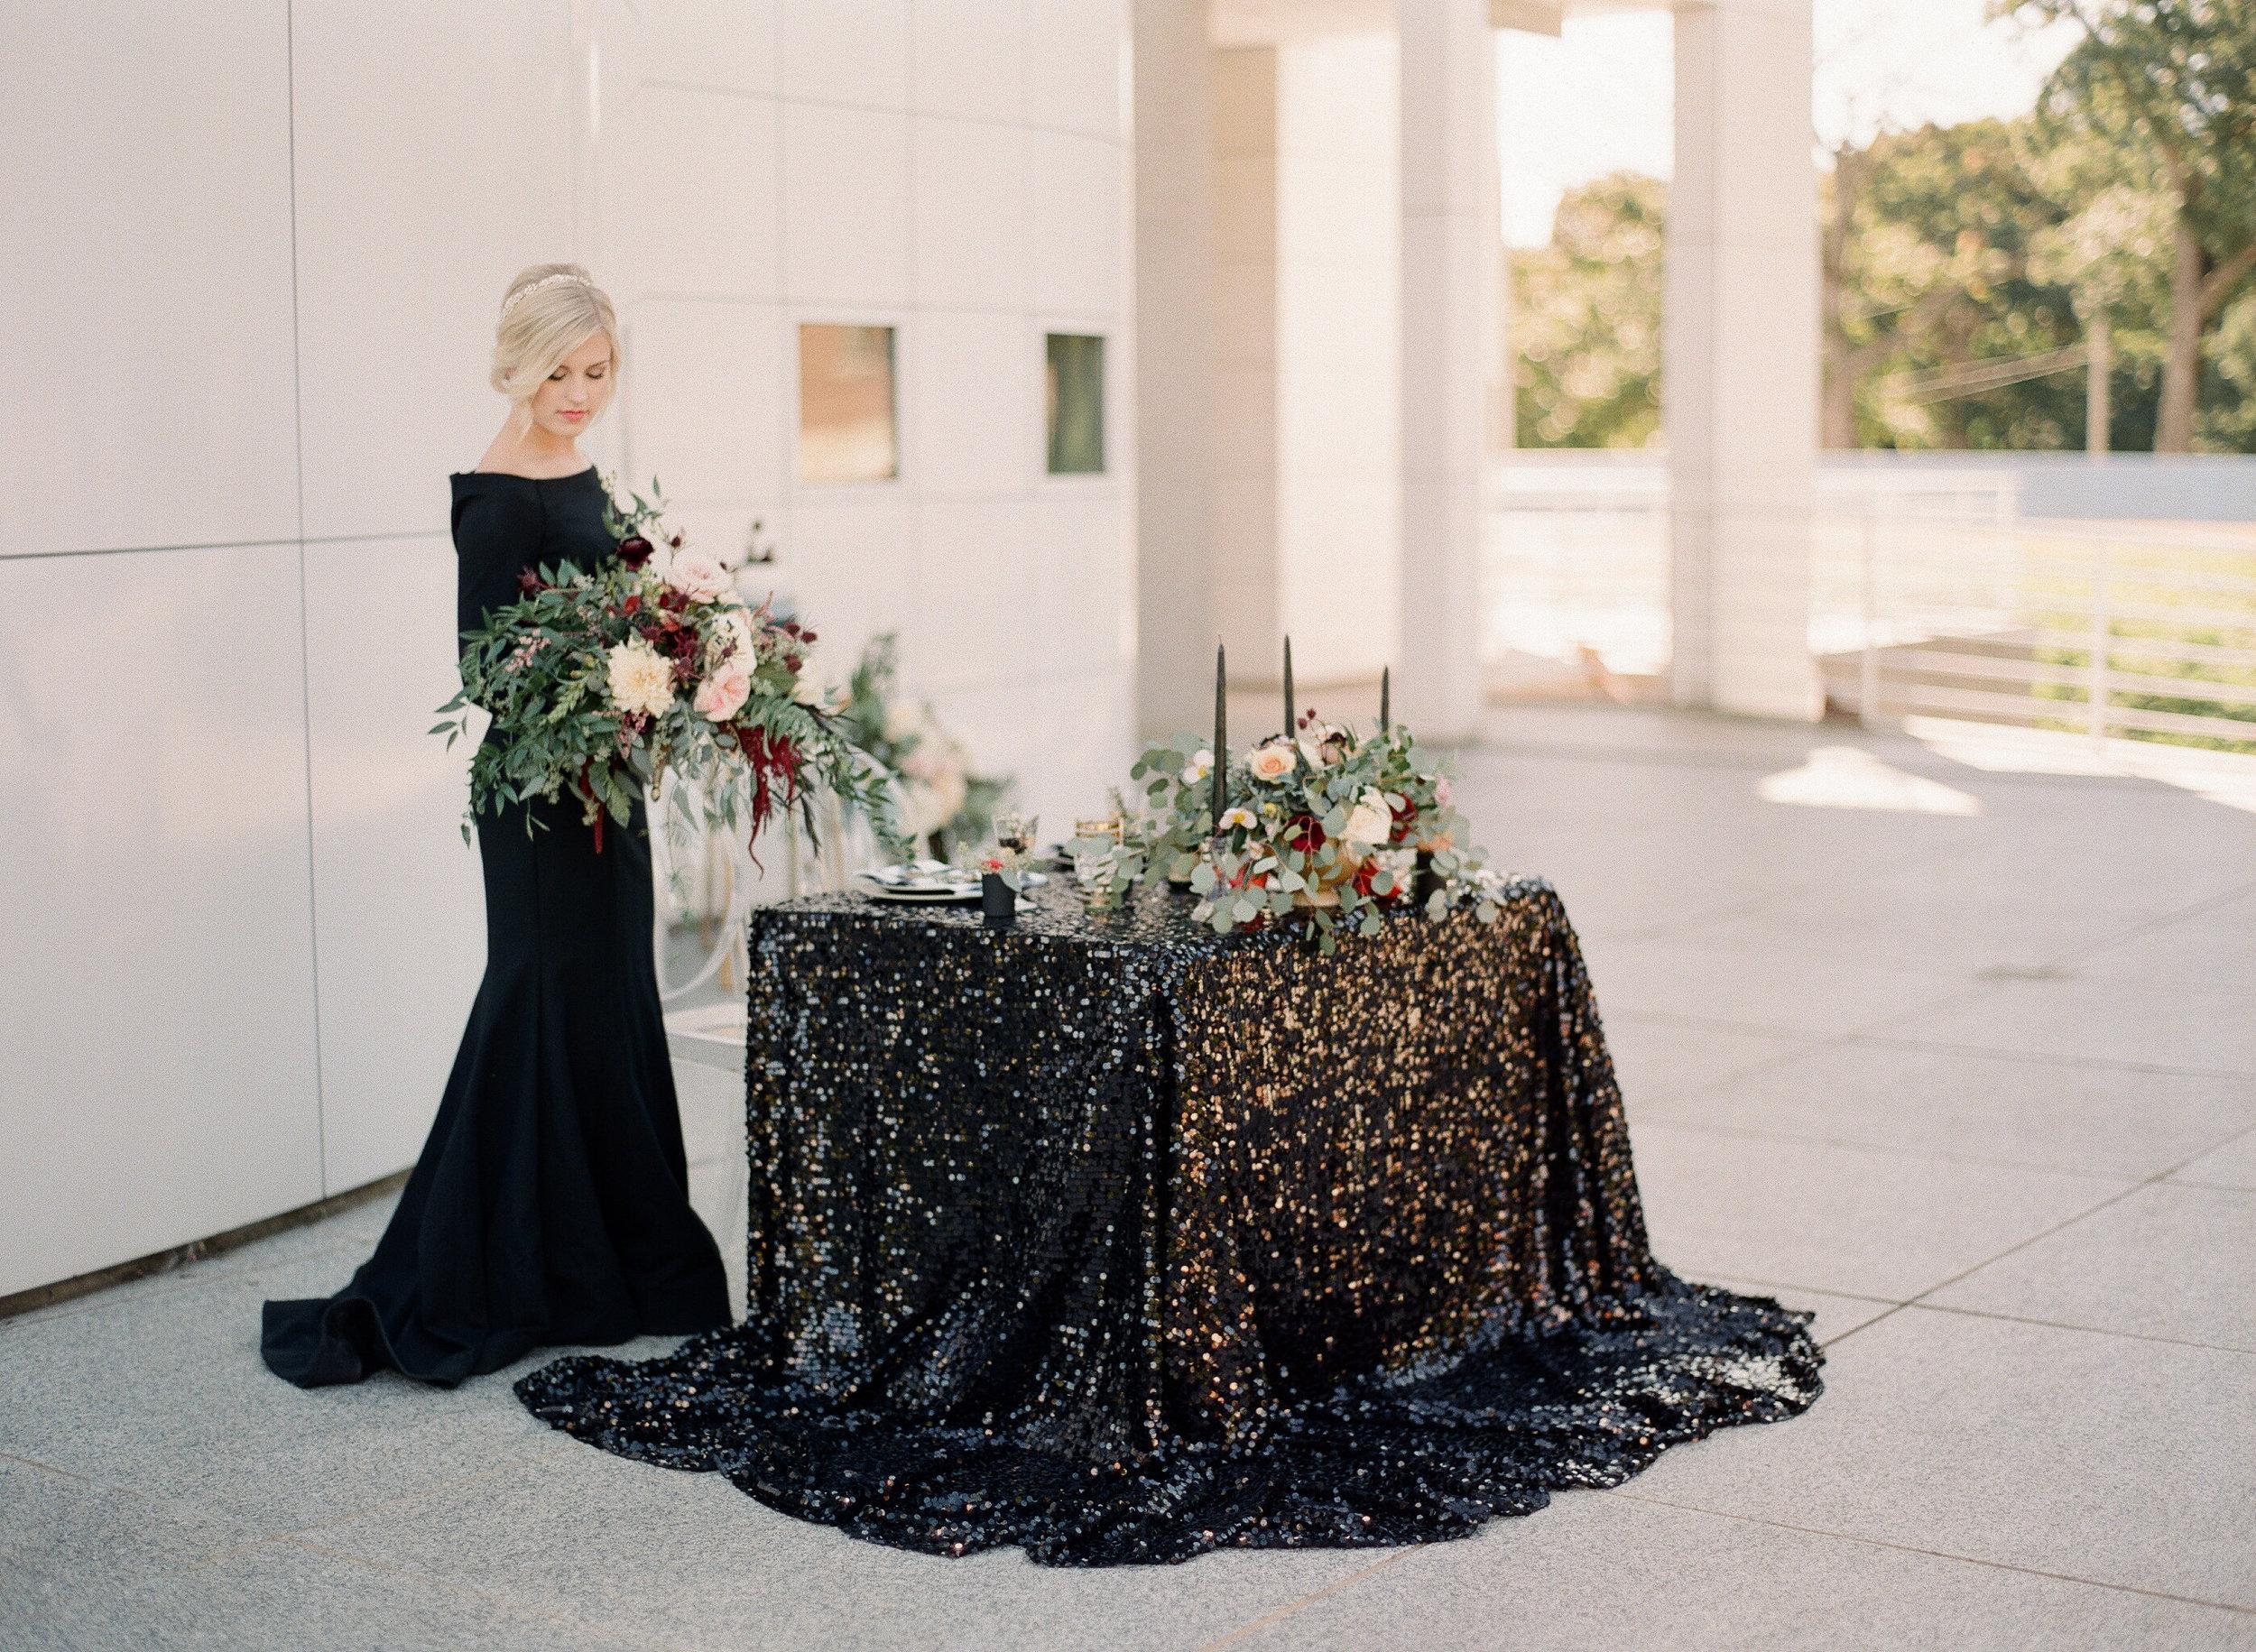 Black Dress Styled Shoot-83.jpg